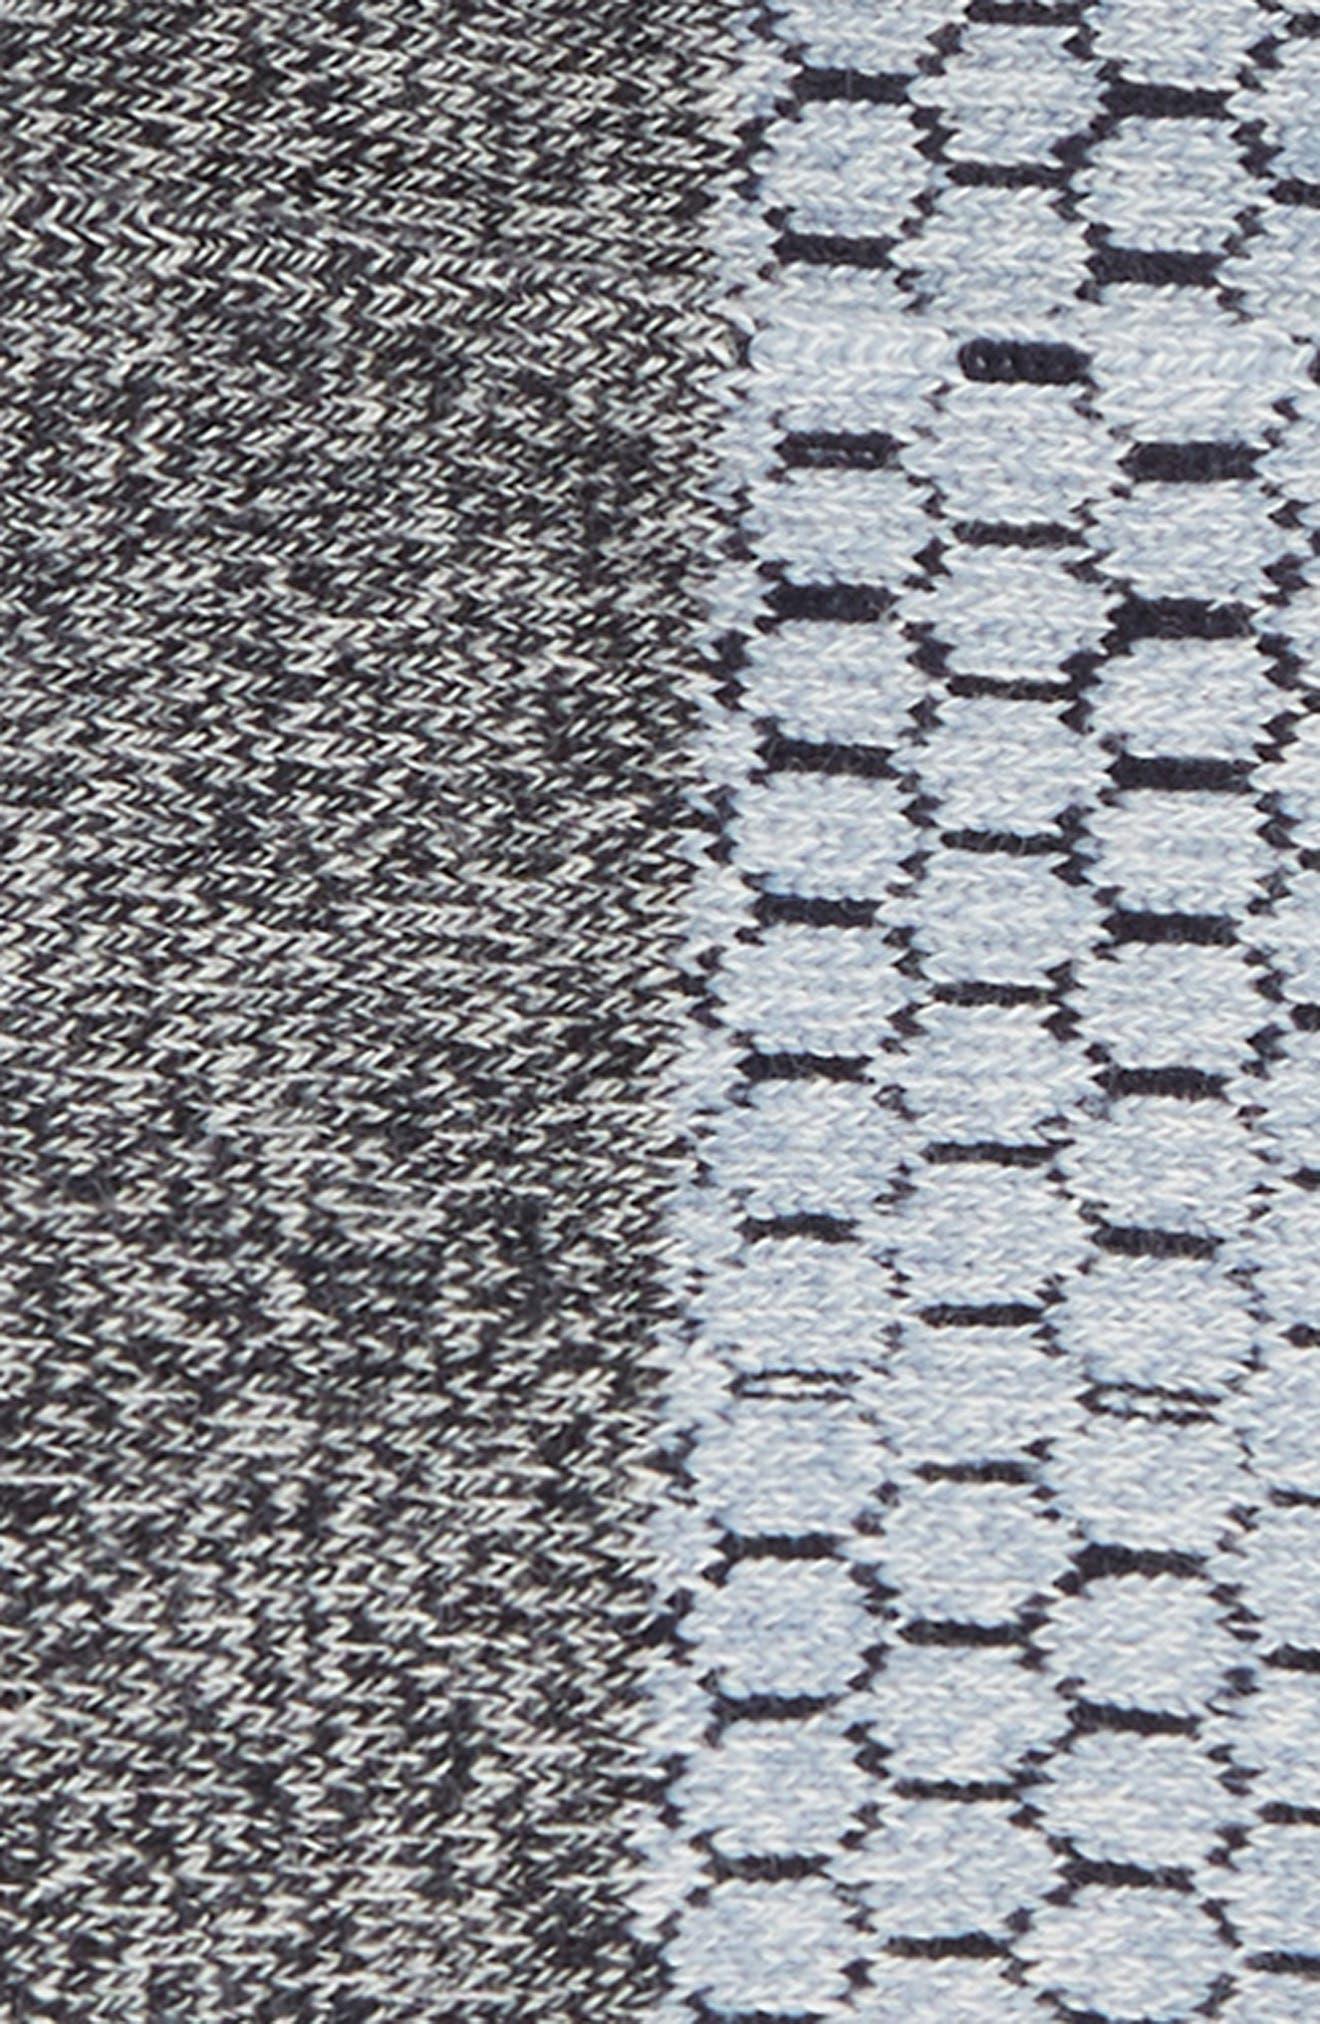 Colorblock Ankle Socks,                             Alternate thumbnail 2, color,                             Midnight/ Soft Blue/ Grey